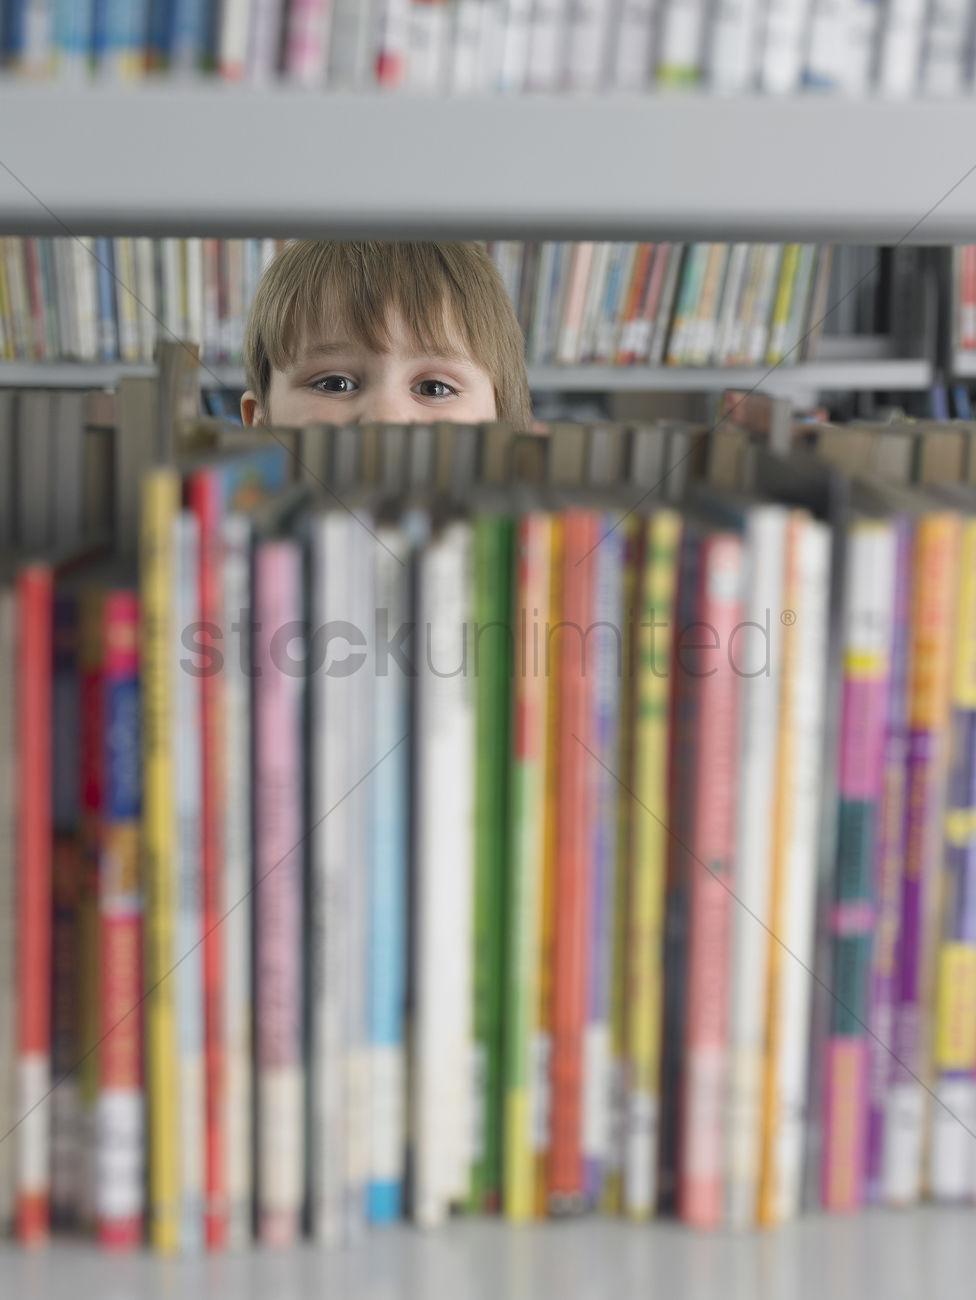 Boy Peeking From Behind Bookshelf In Library Stock Photo